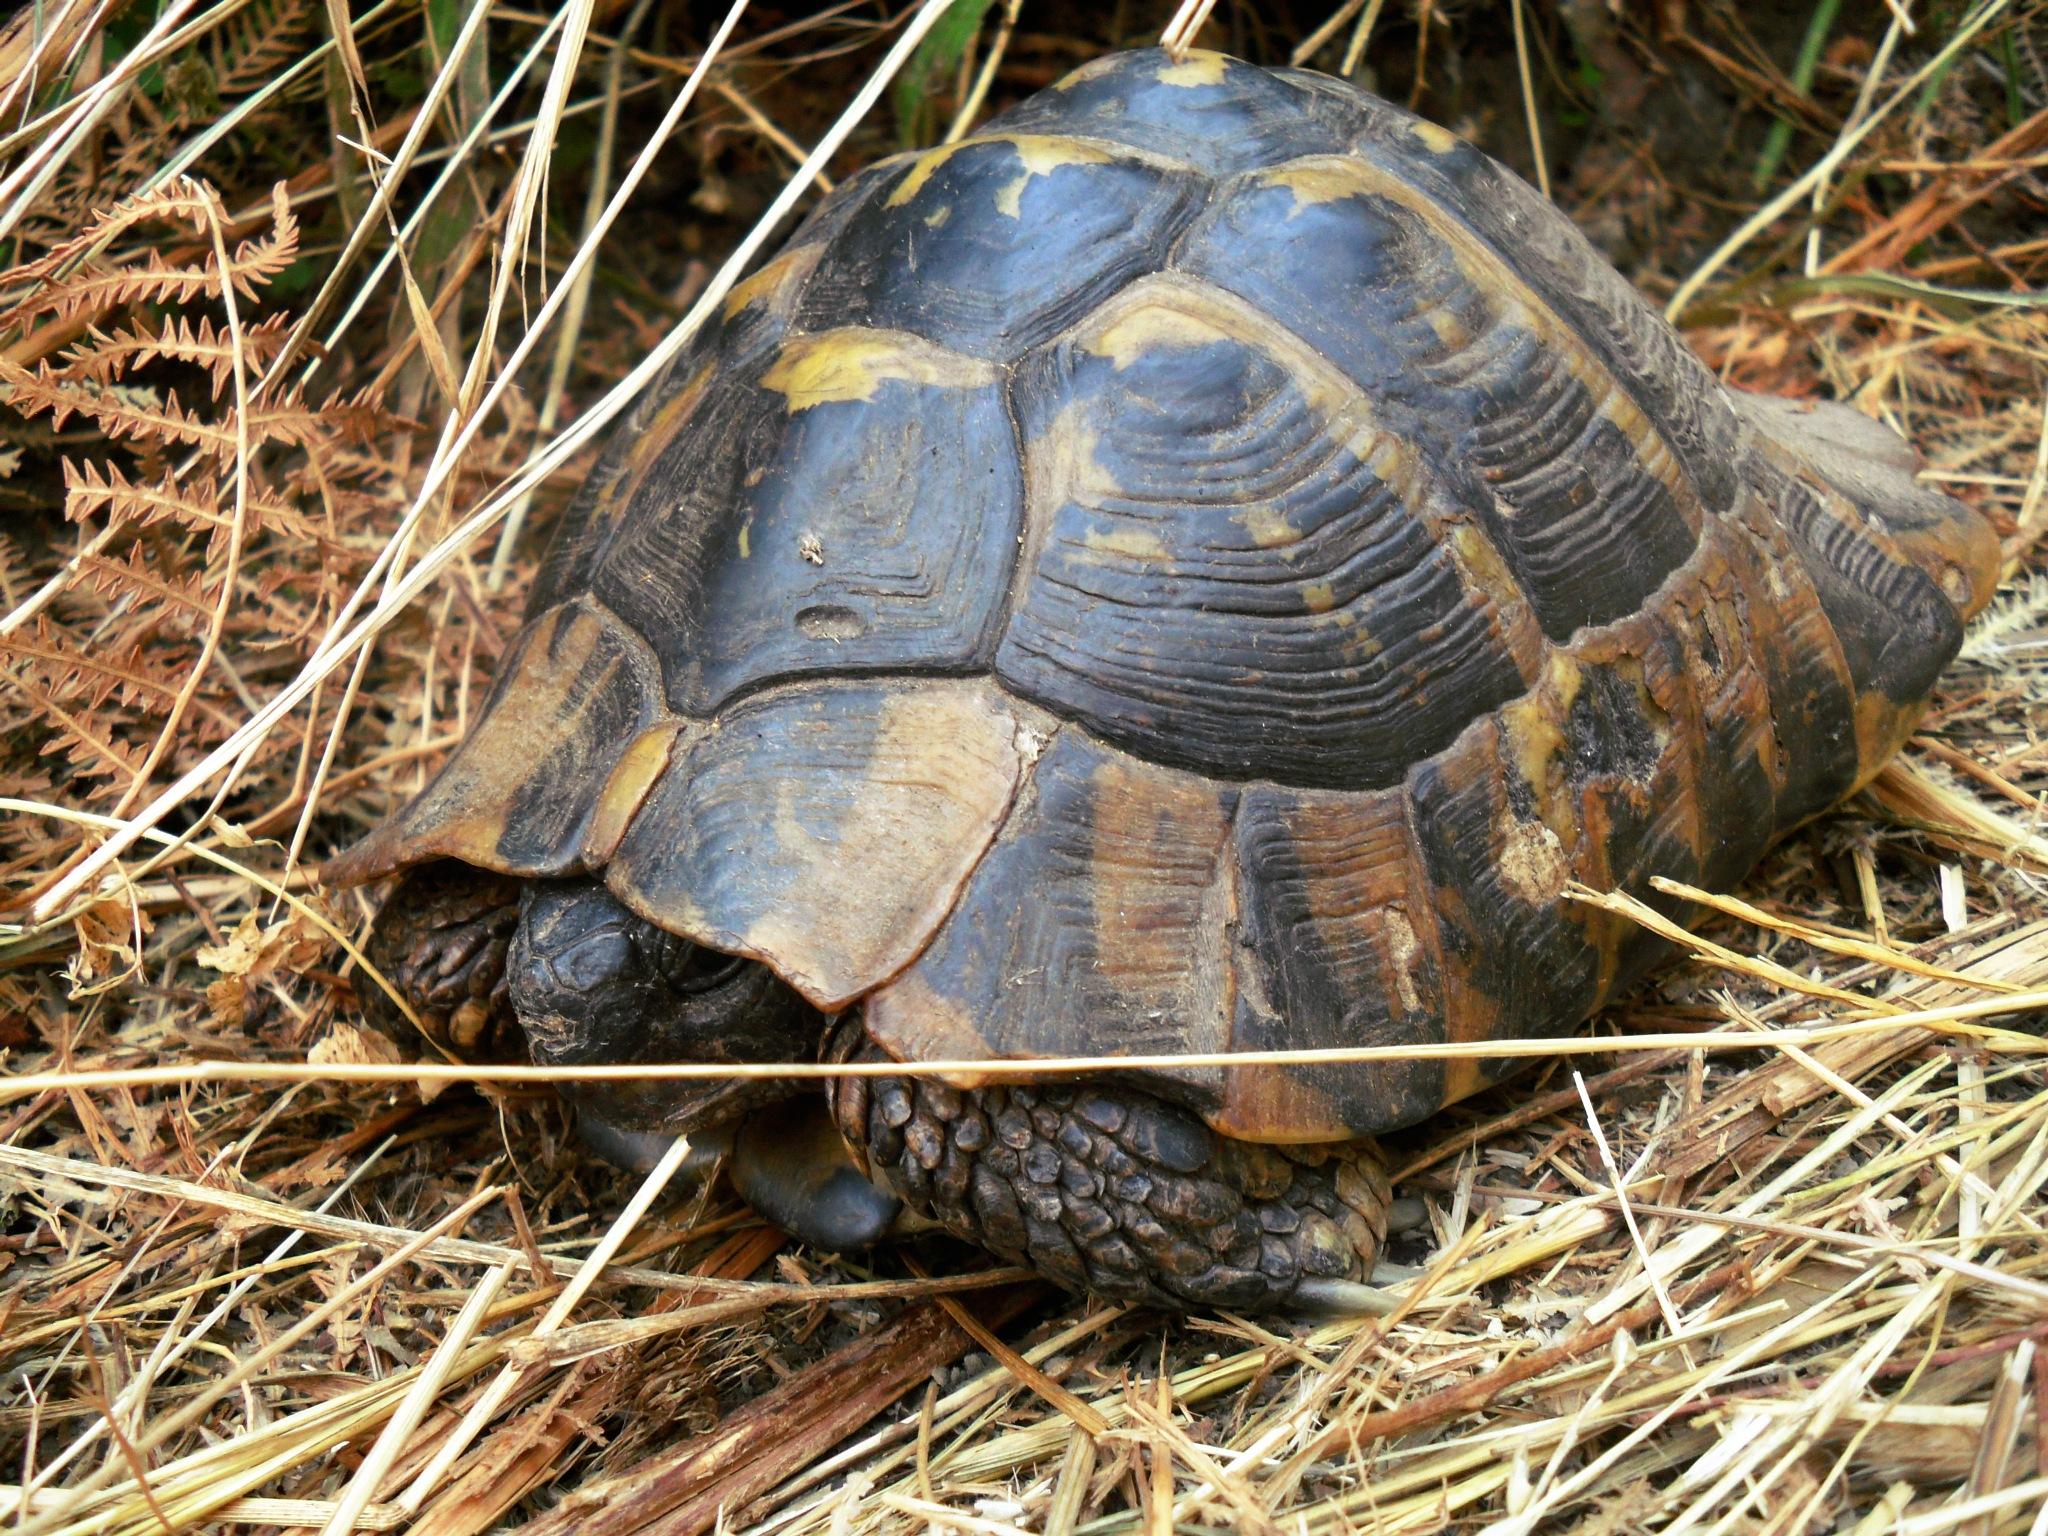 Turtle by Mensur H. Luma